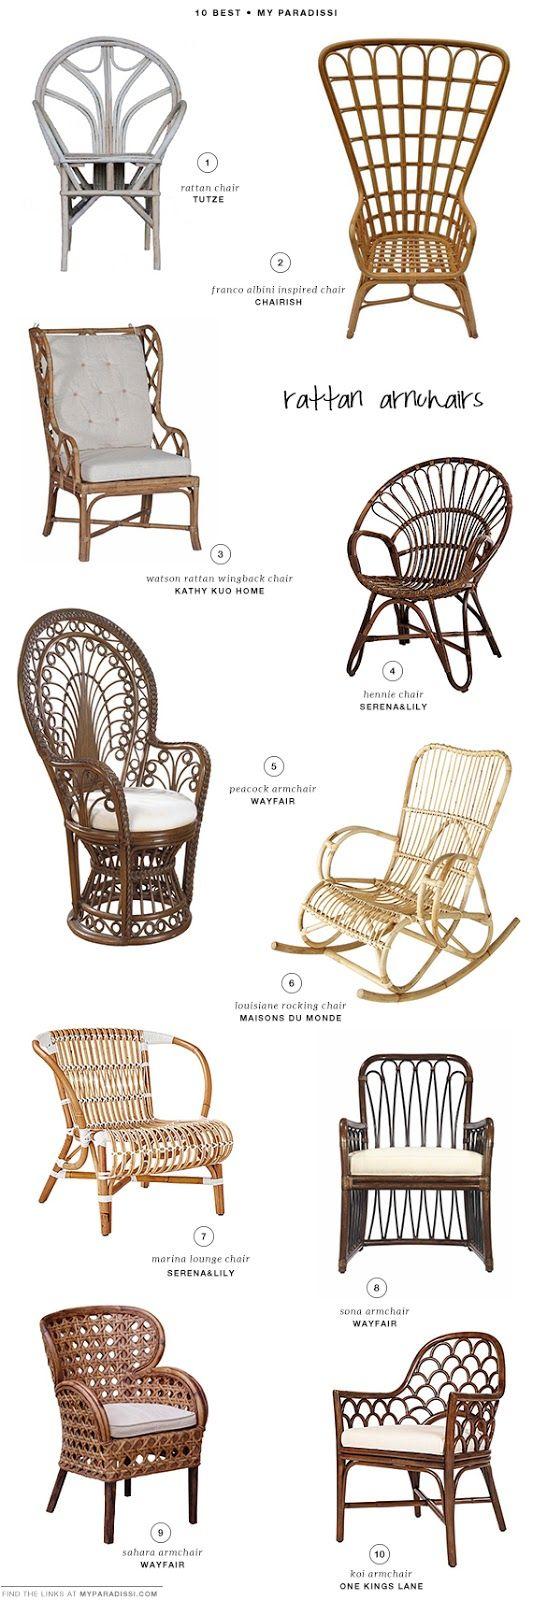 10 BEST: Rattan armchairs   My Paradissi